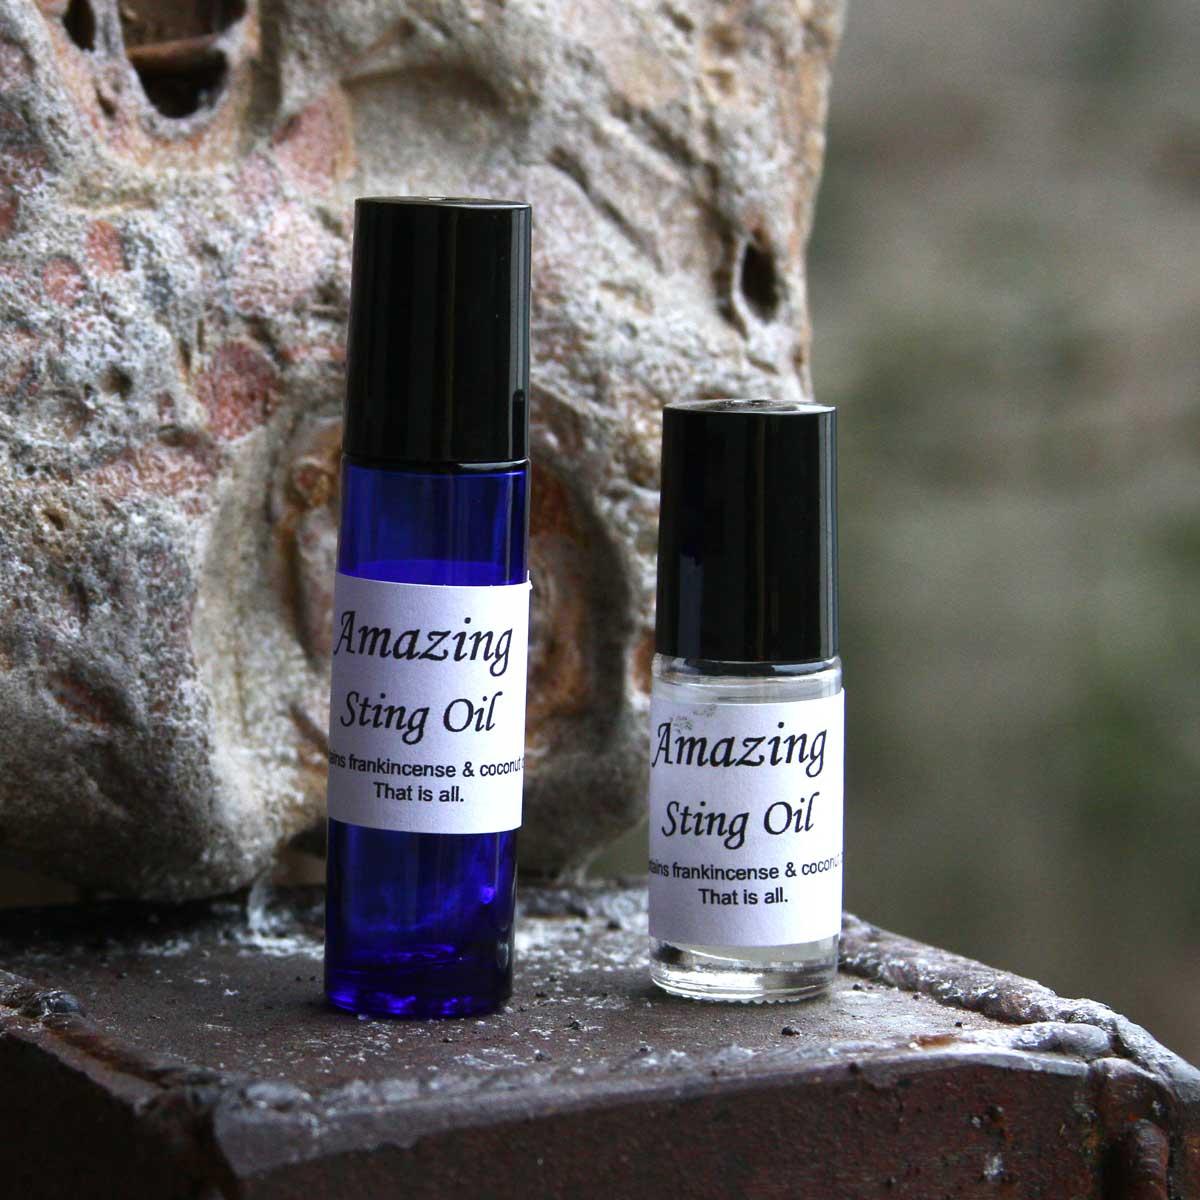 Amazing Sting Oil from Wild Ozark